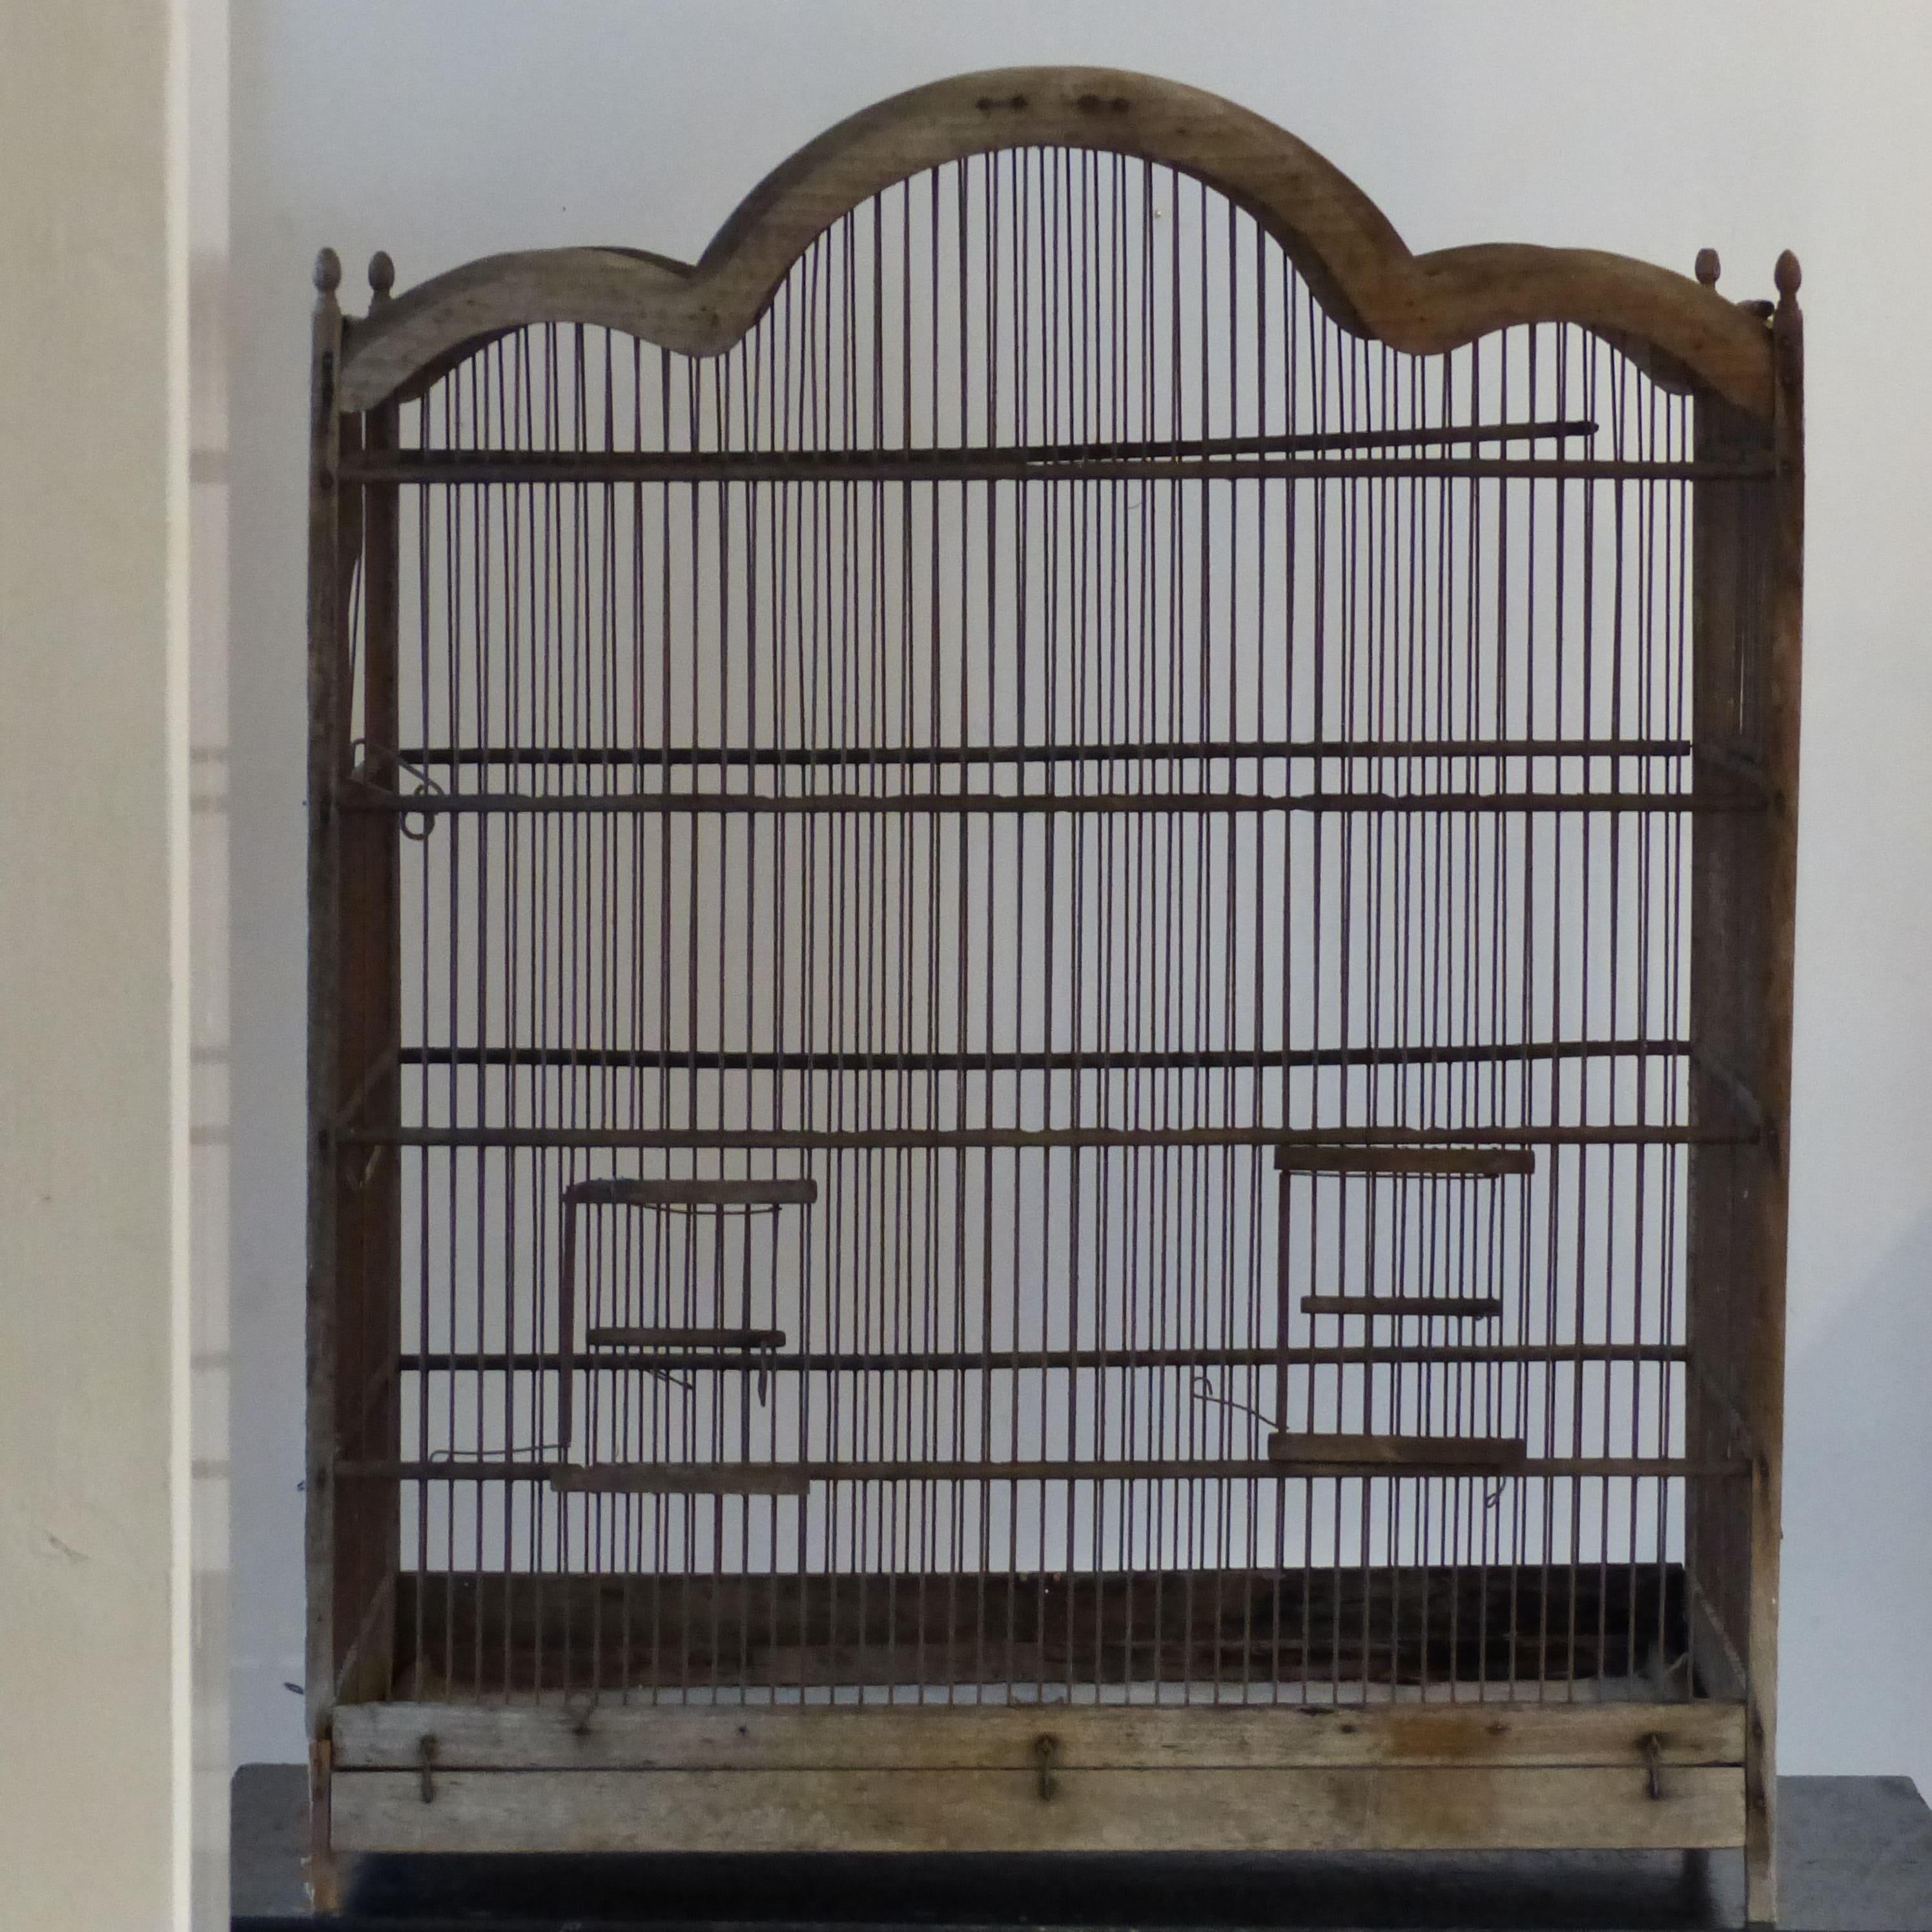 grande cage oiseaux grillag e lignedebrocante brocante en ligne chine pour vous meubles. Black Bedroom Furniture Sets. Home Design Ideas